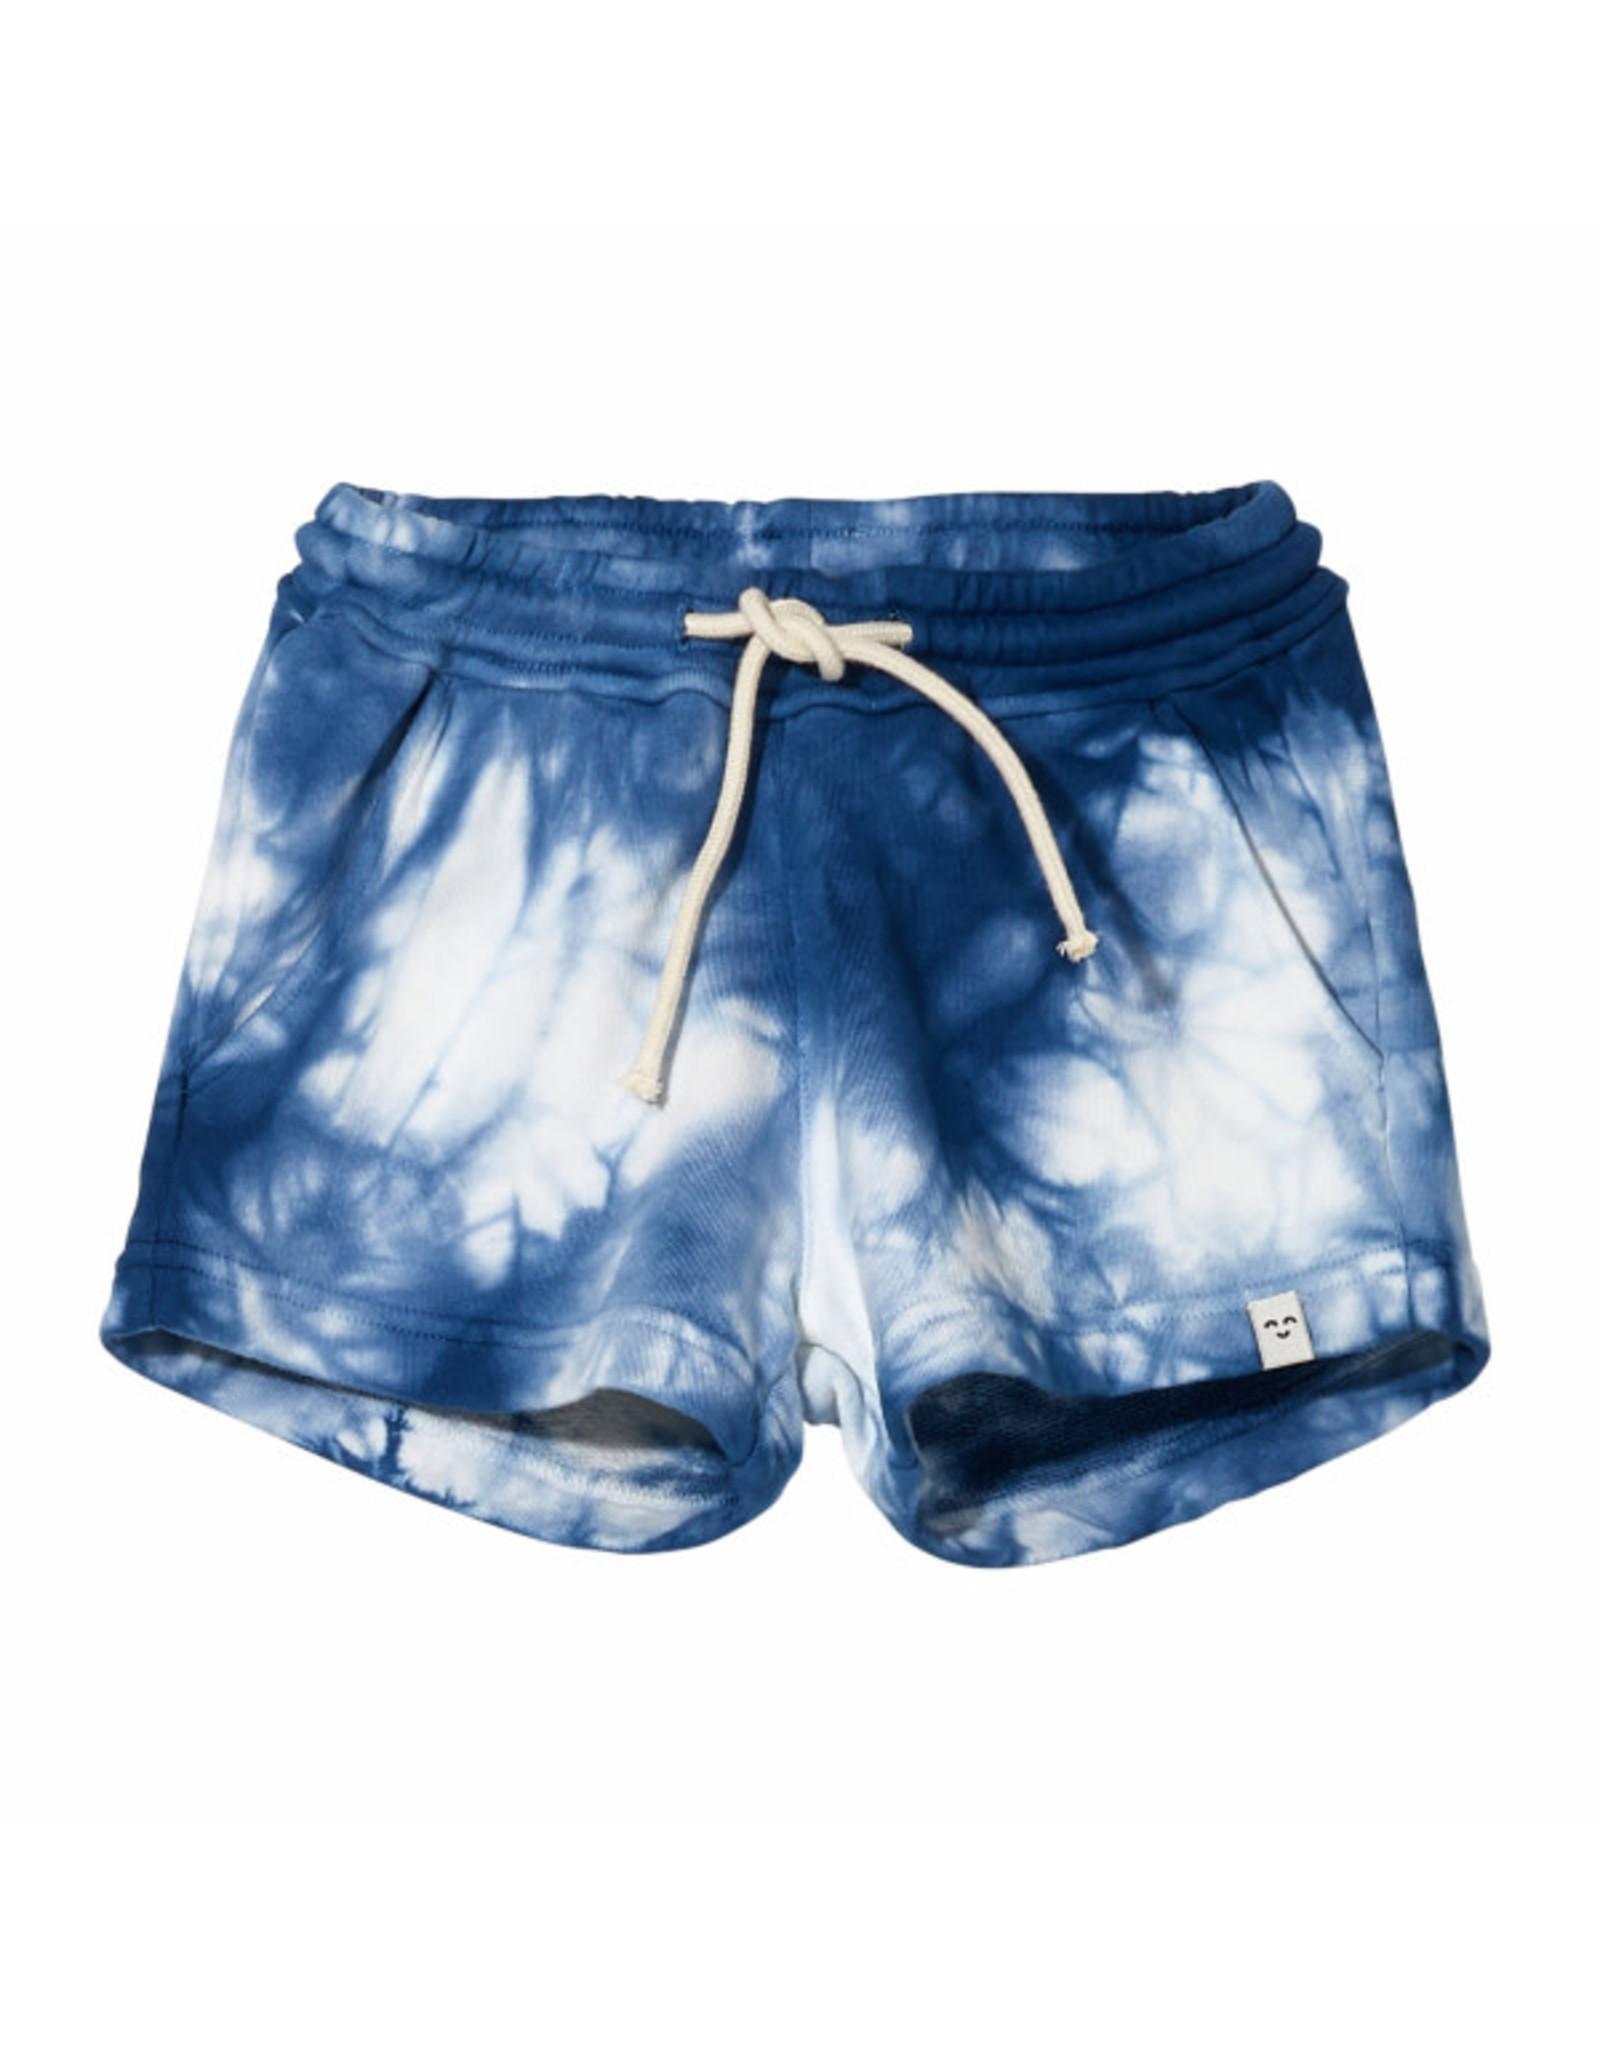 FITN SS21 Trinity tie&dye shorts